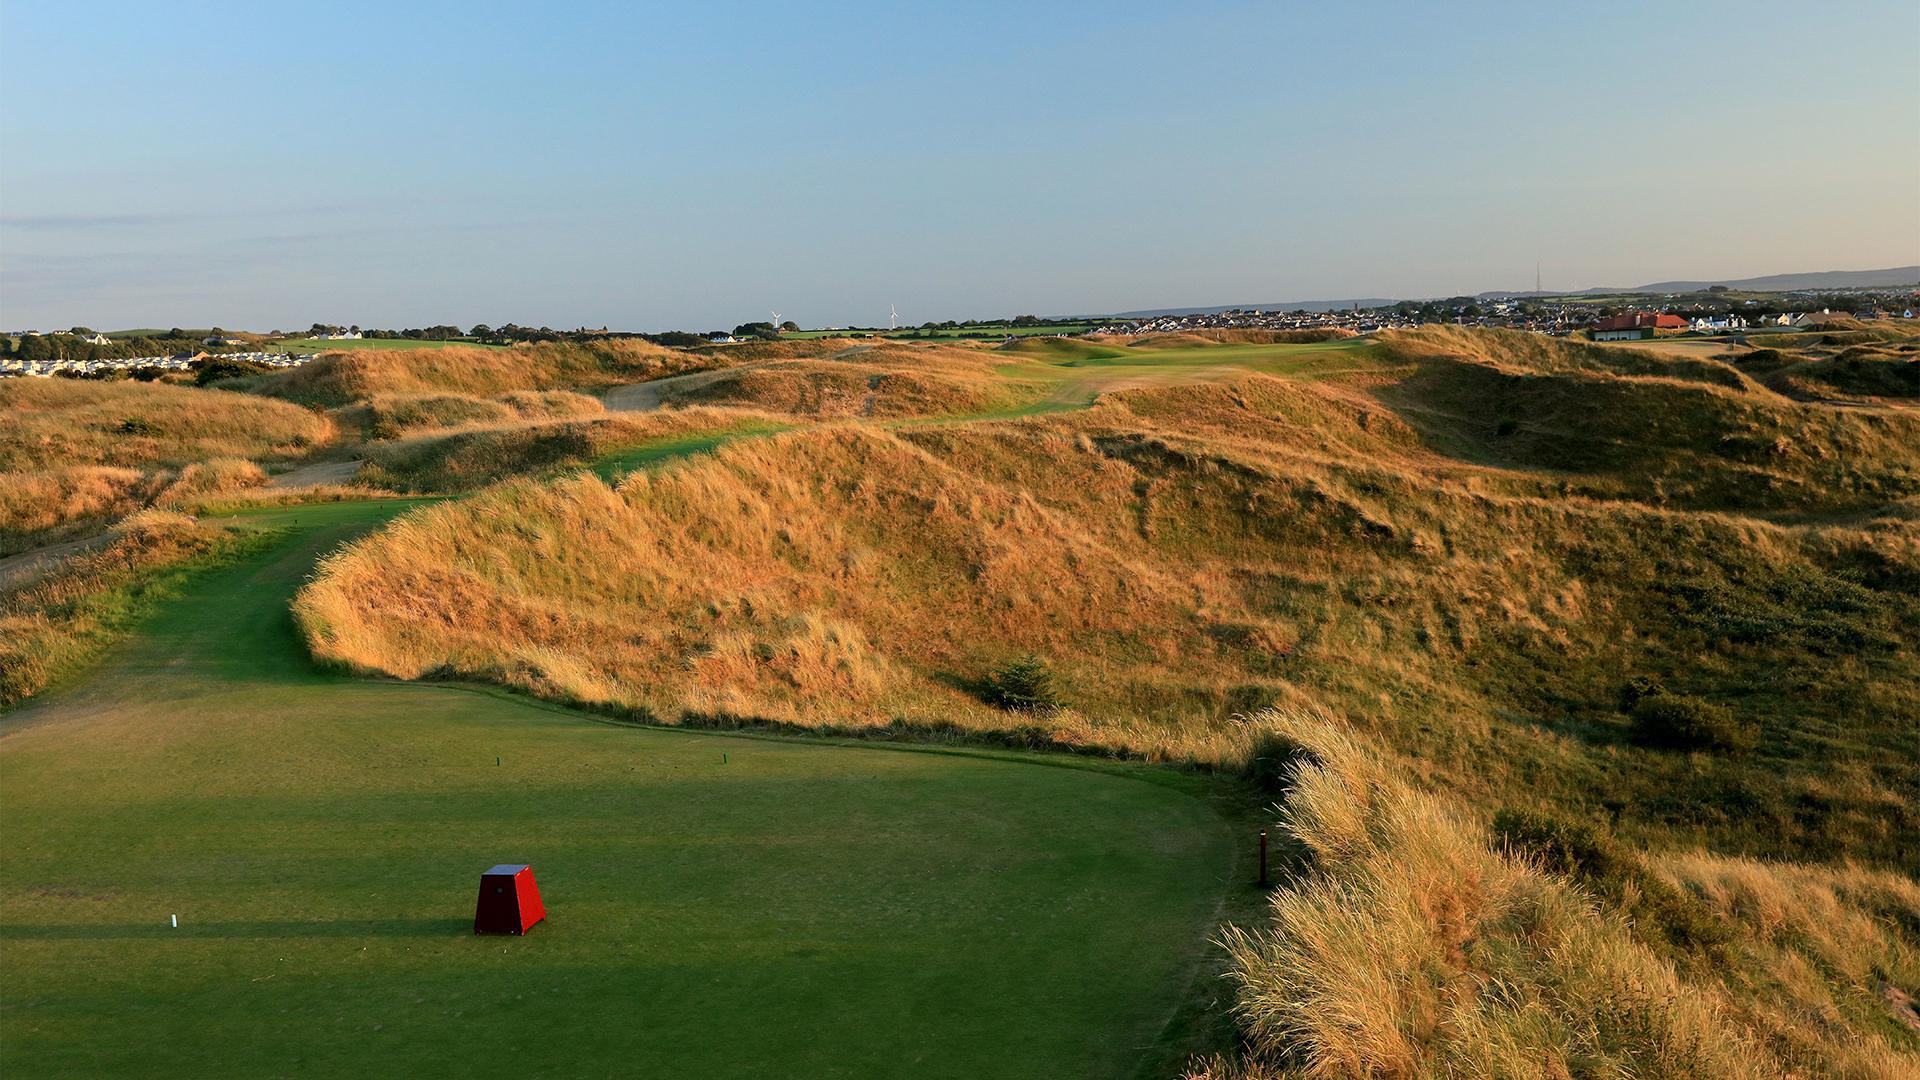 Royal Portrush, 16th hole, Dunluce Links golf course